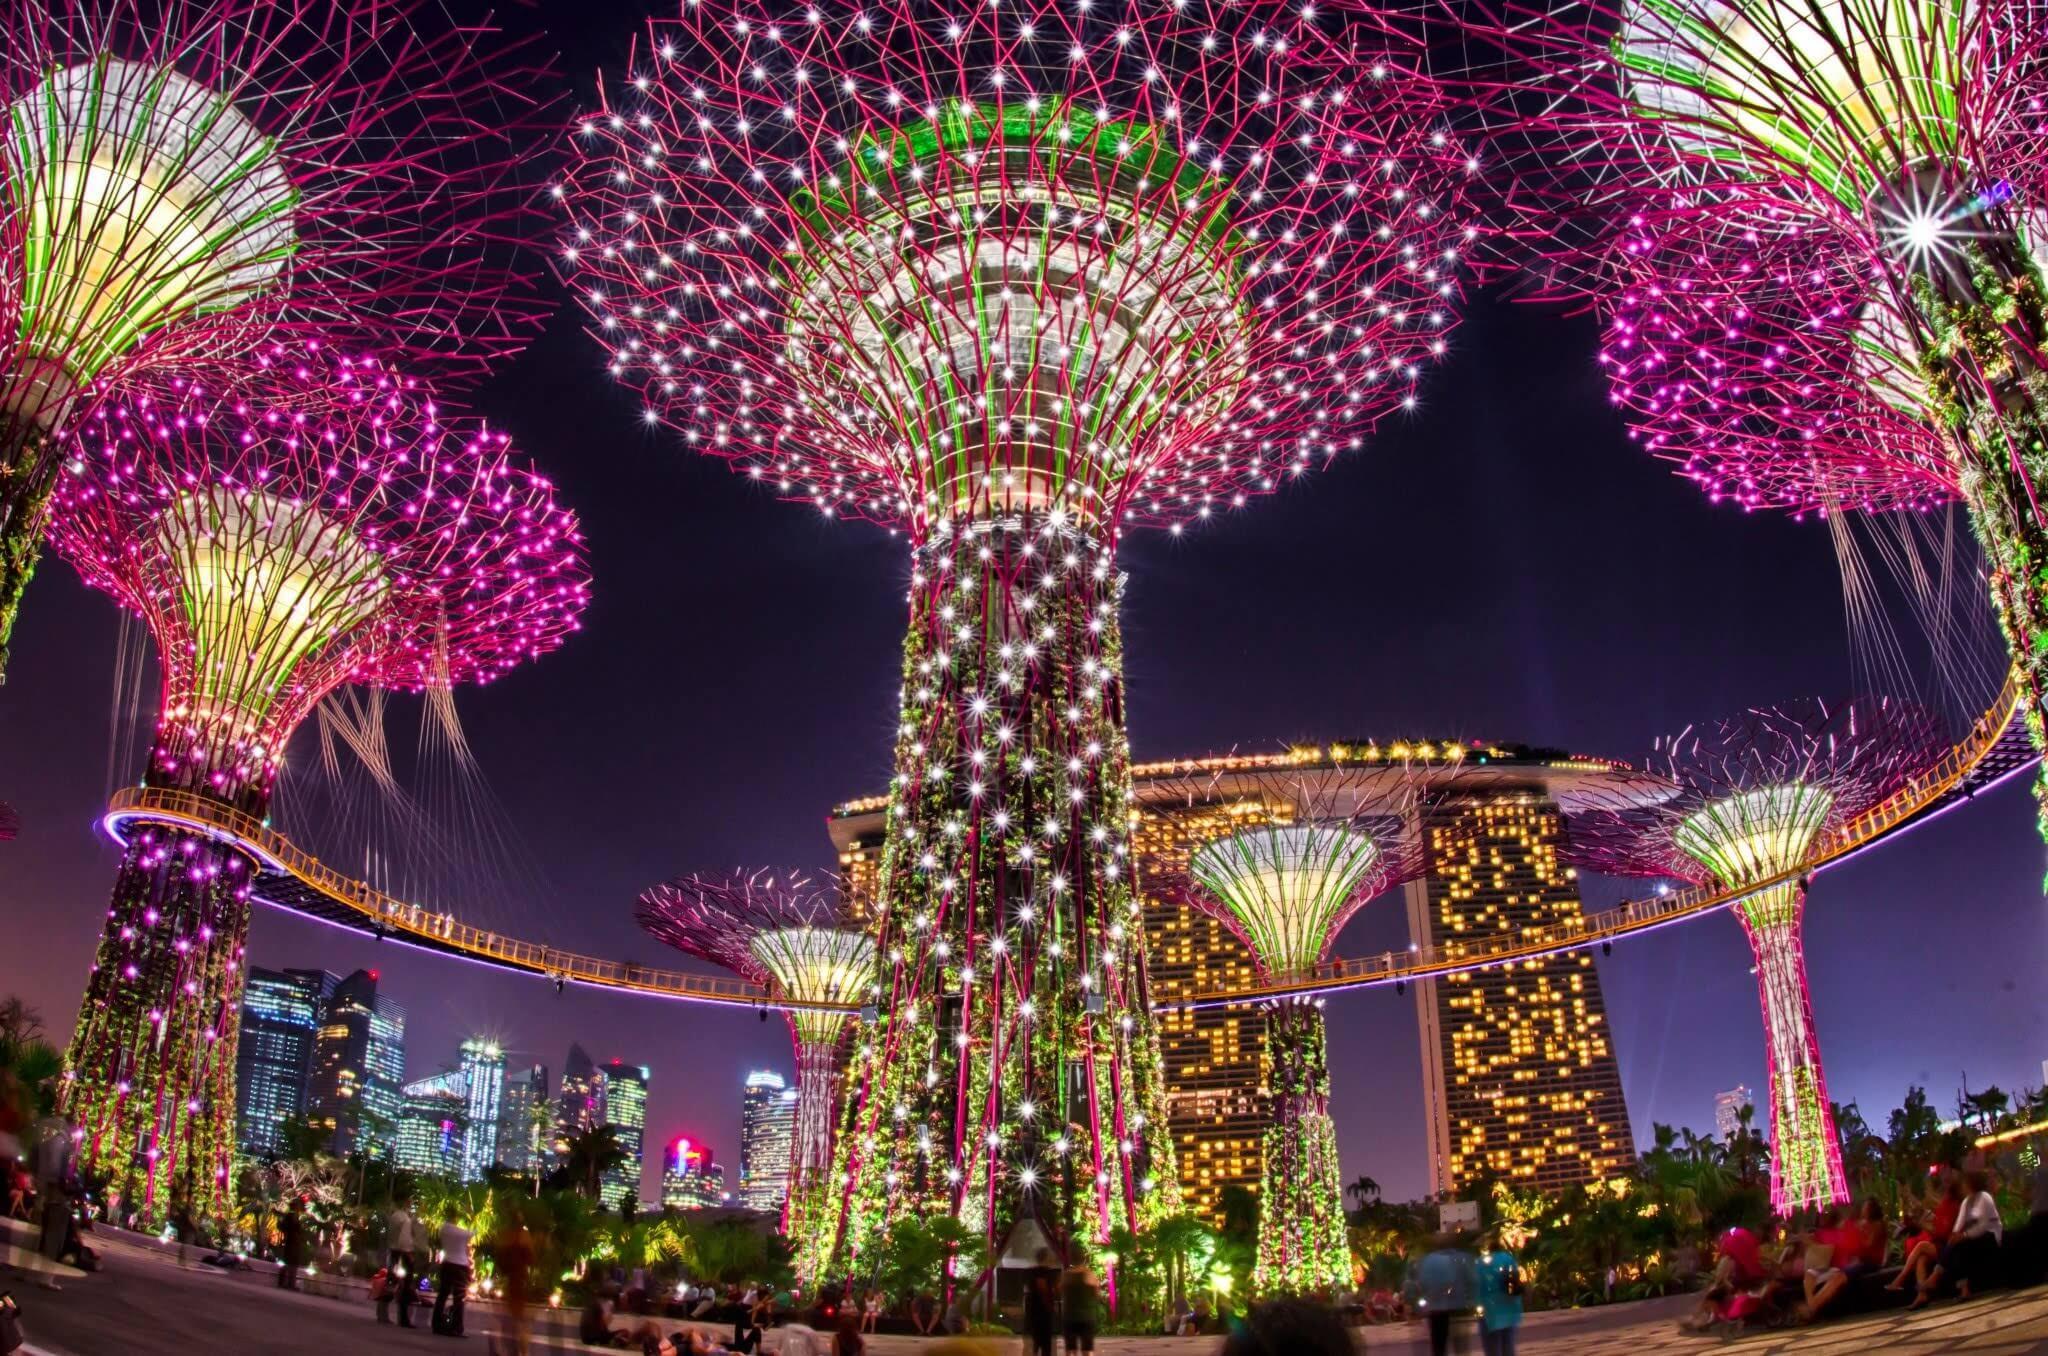 Singapore architecture 8 (1)